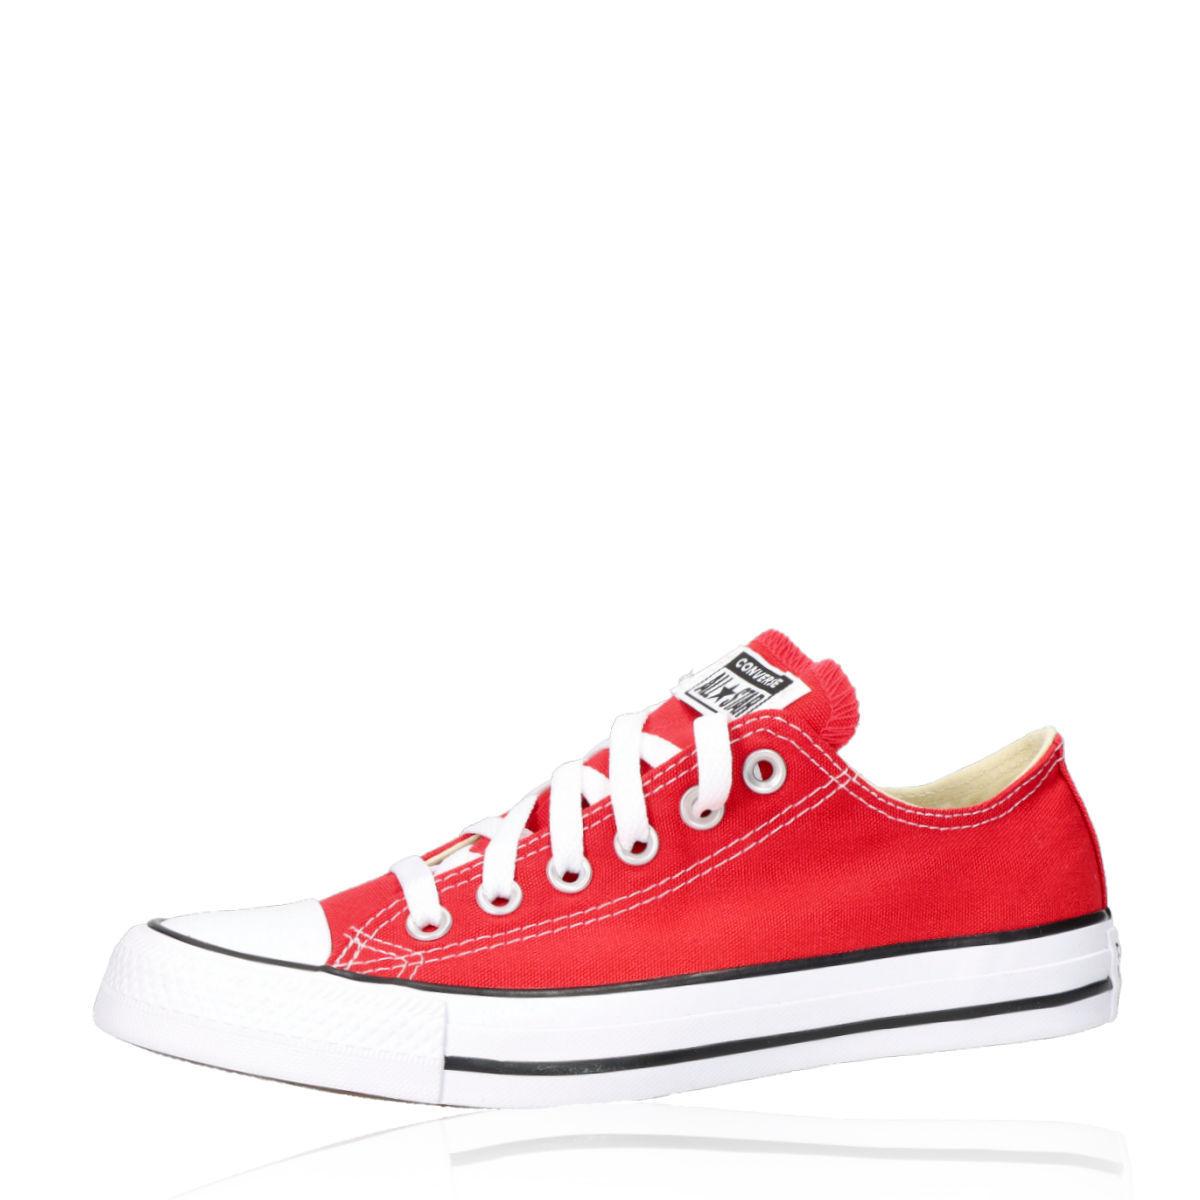 37f0573aaf3bf Converse dámské štýlové plátené tenisky - červené | M9696-RED www ...